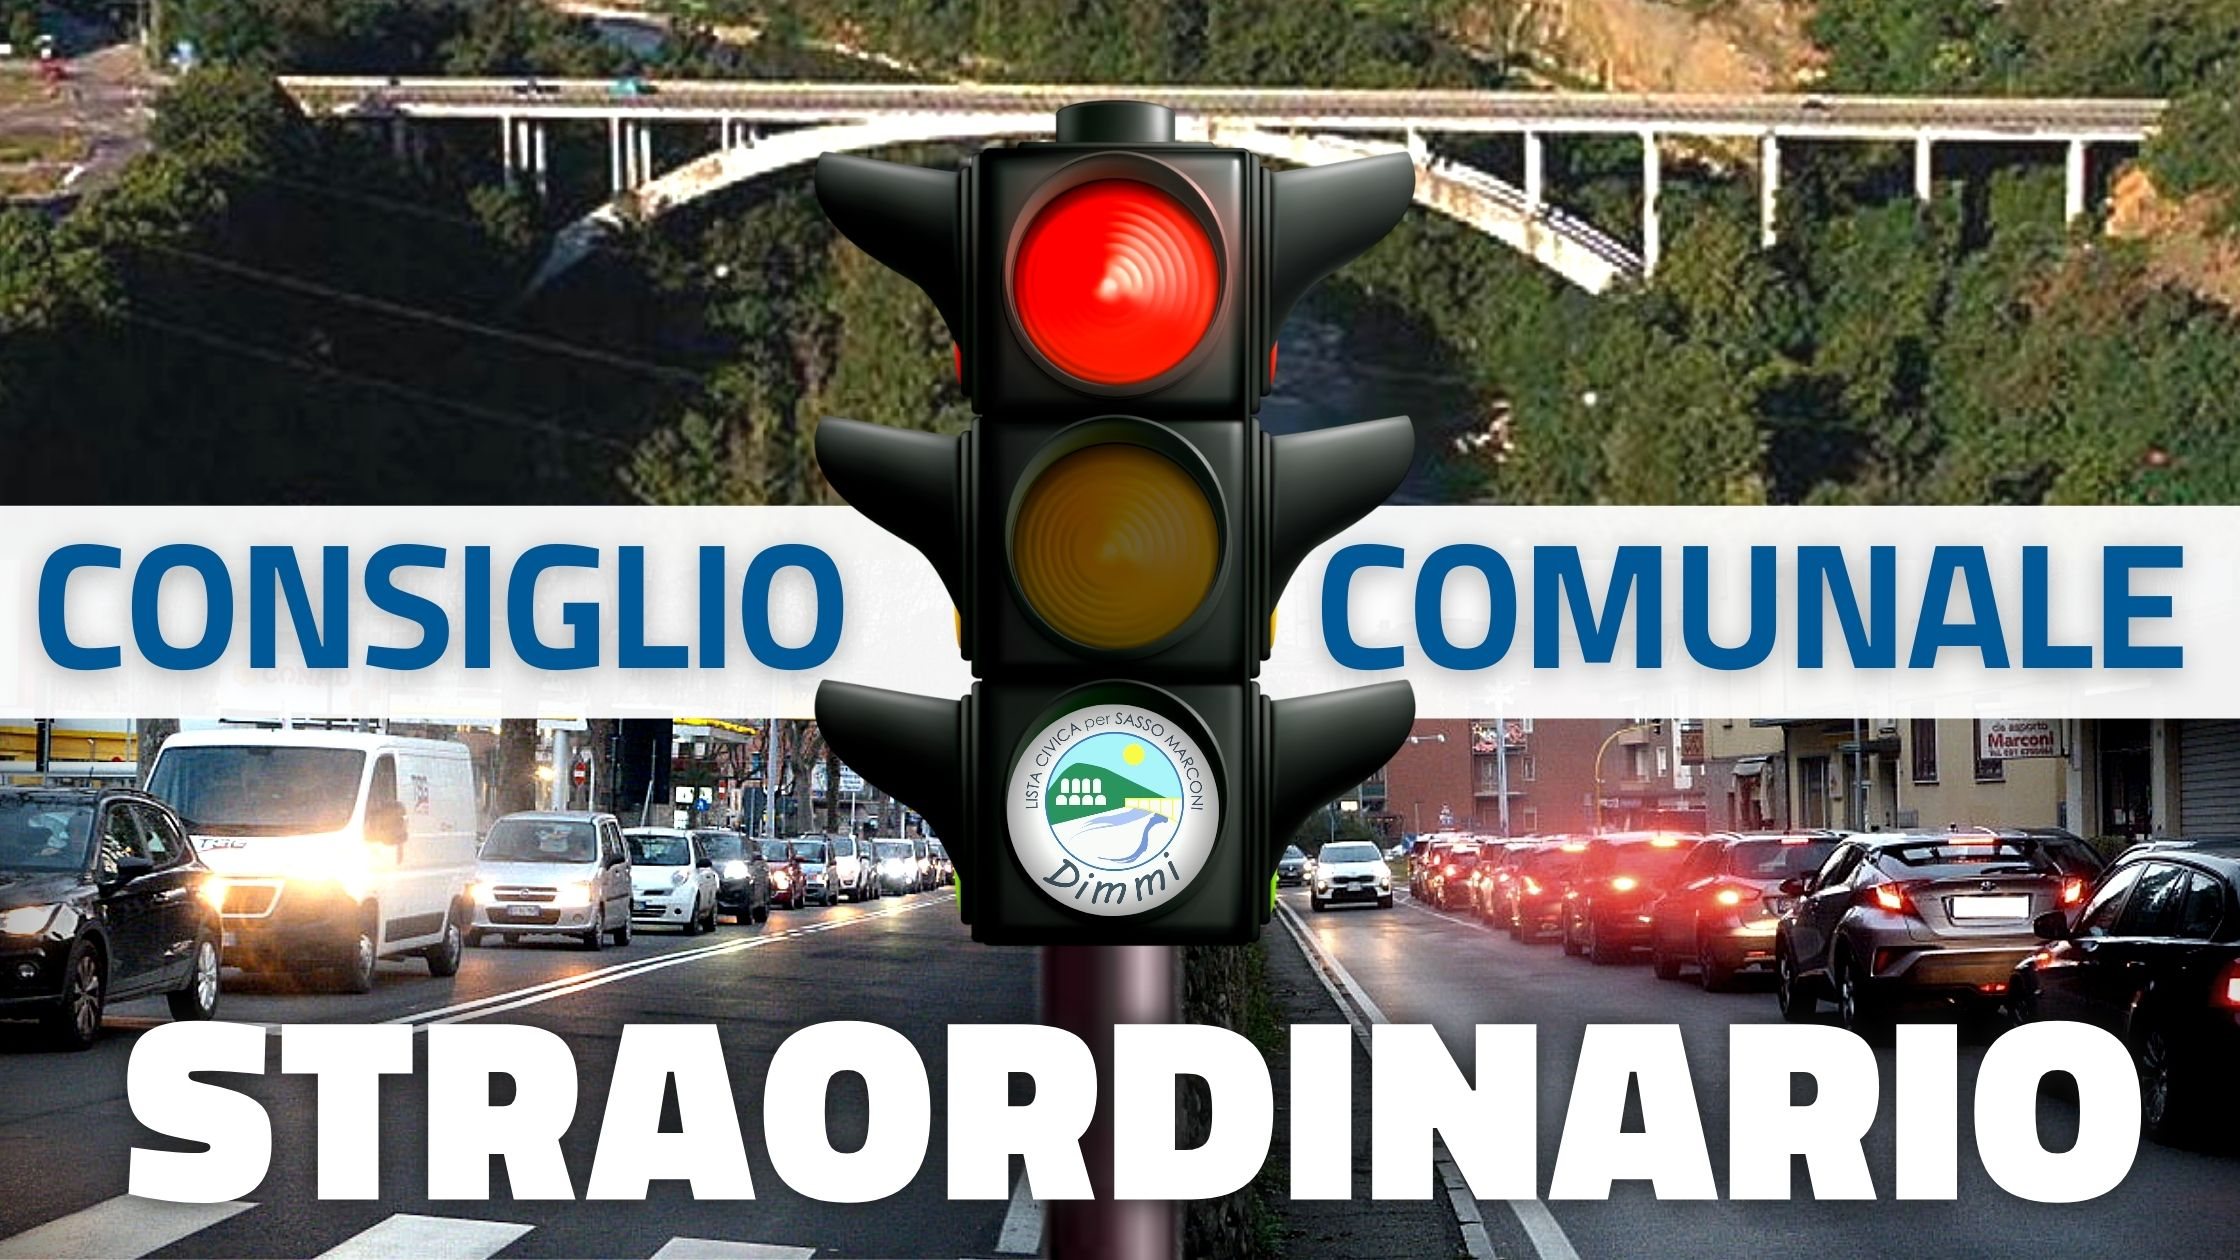 You are currently viewing Consiglio Comunale STRAORDINARIO